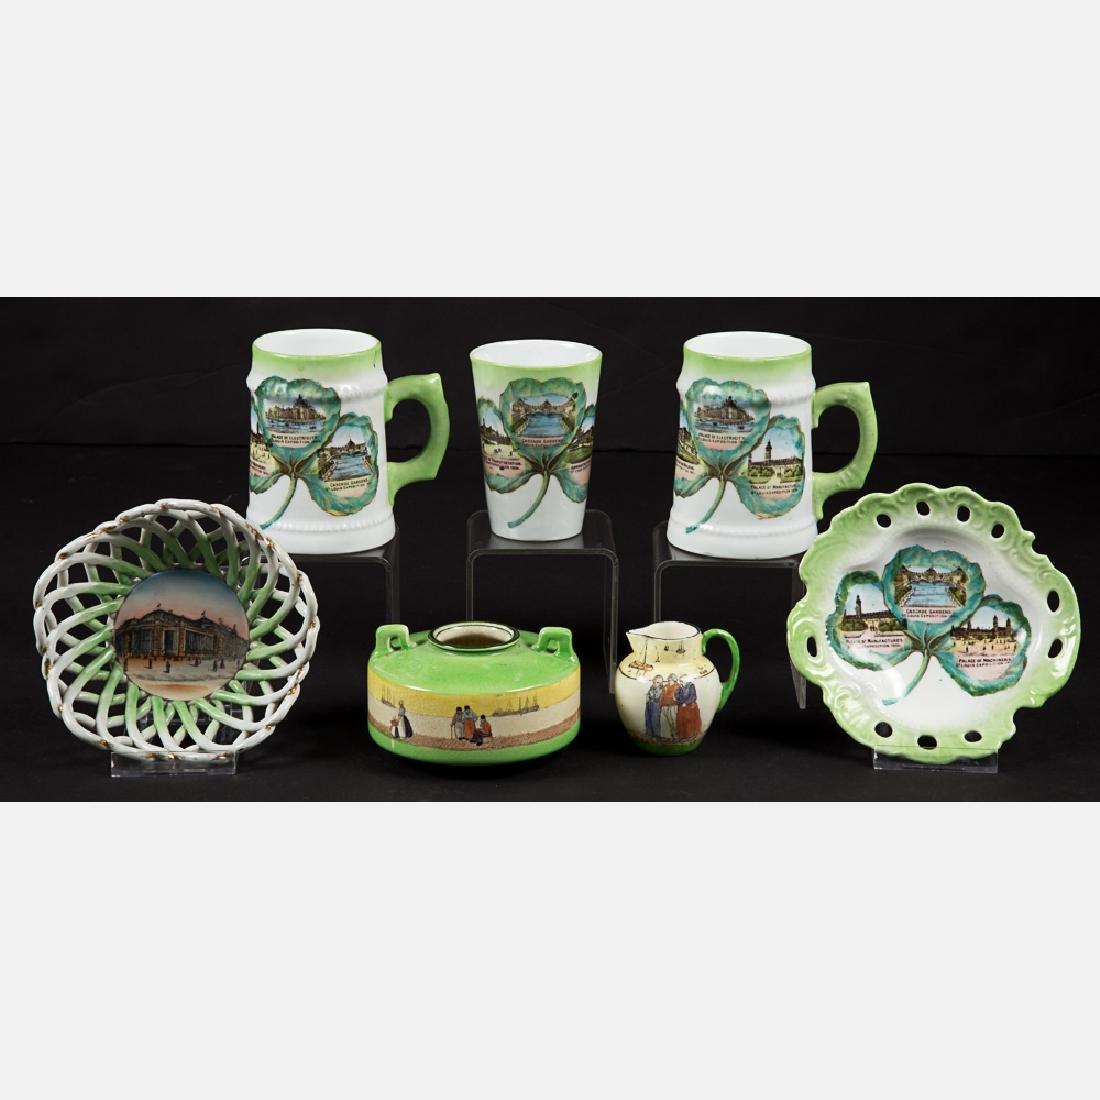 A Miscellaneous Collection of Seven Porcelain